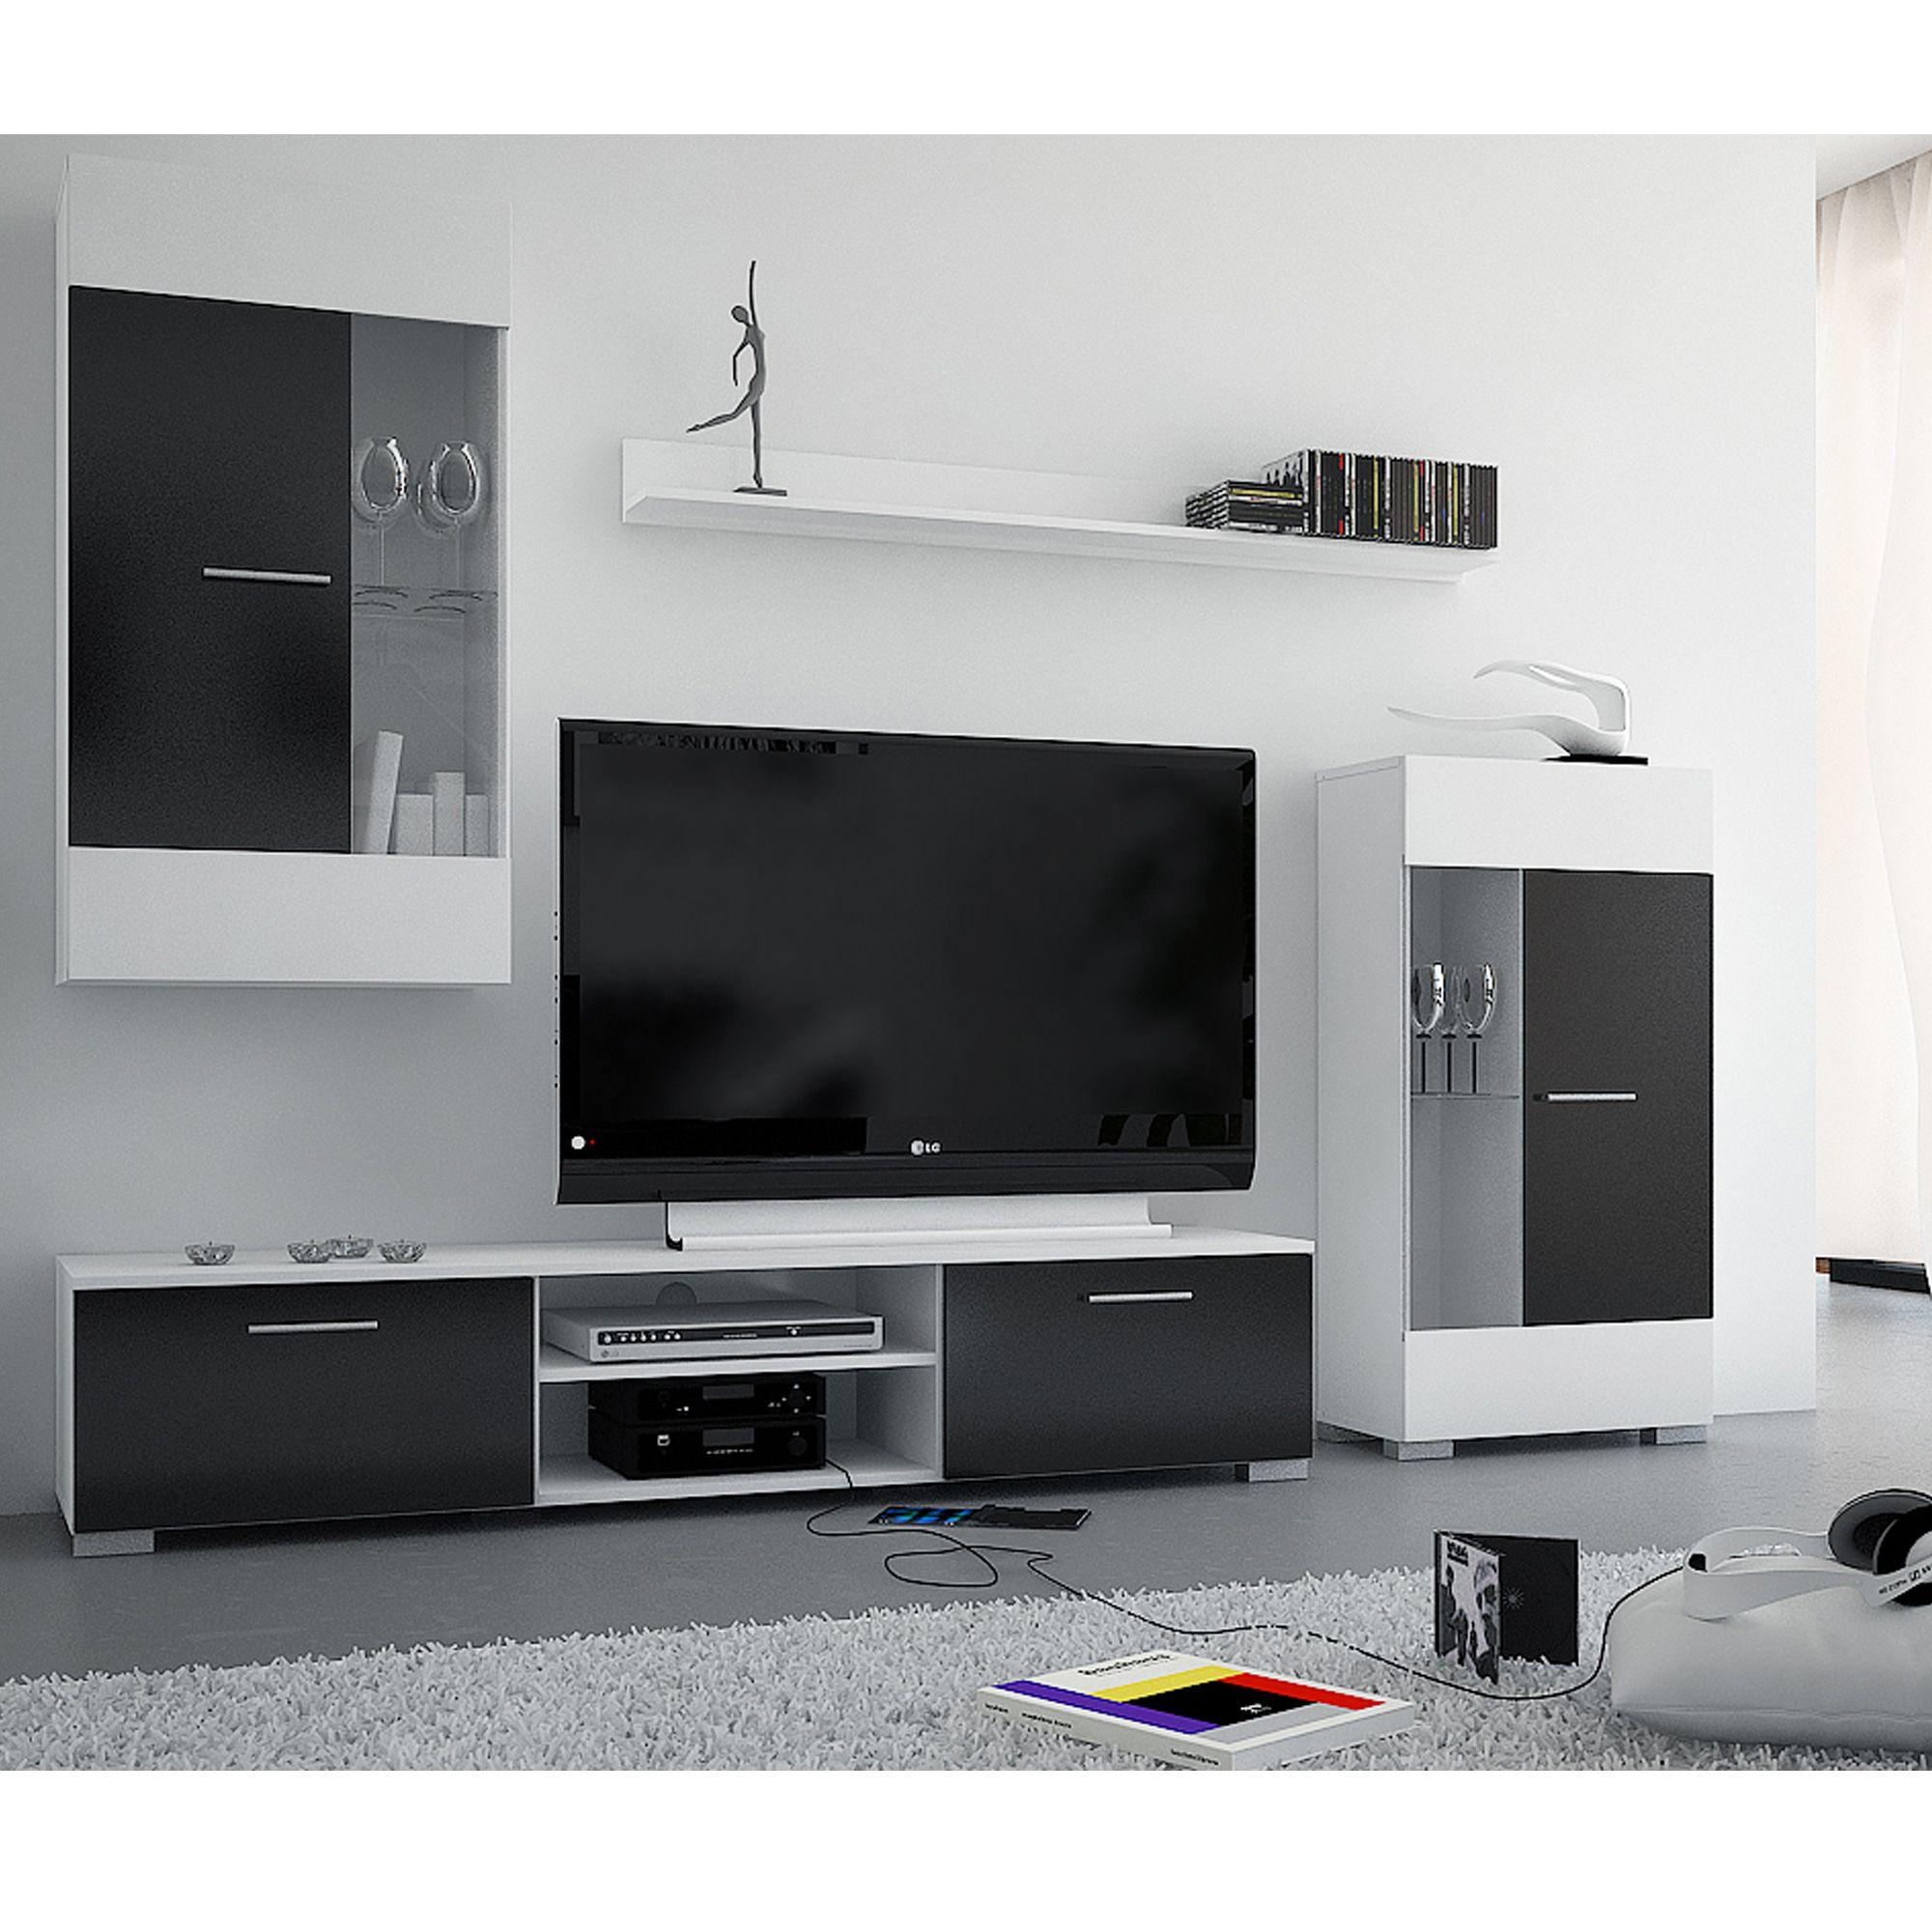 Ensemble meuble tv bravo noir blanc prix promo la maison for Meuble tv promotion